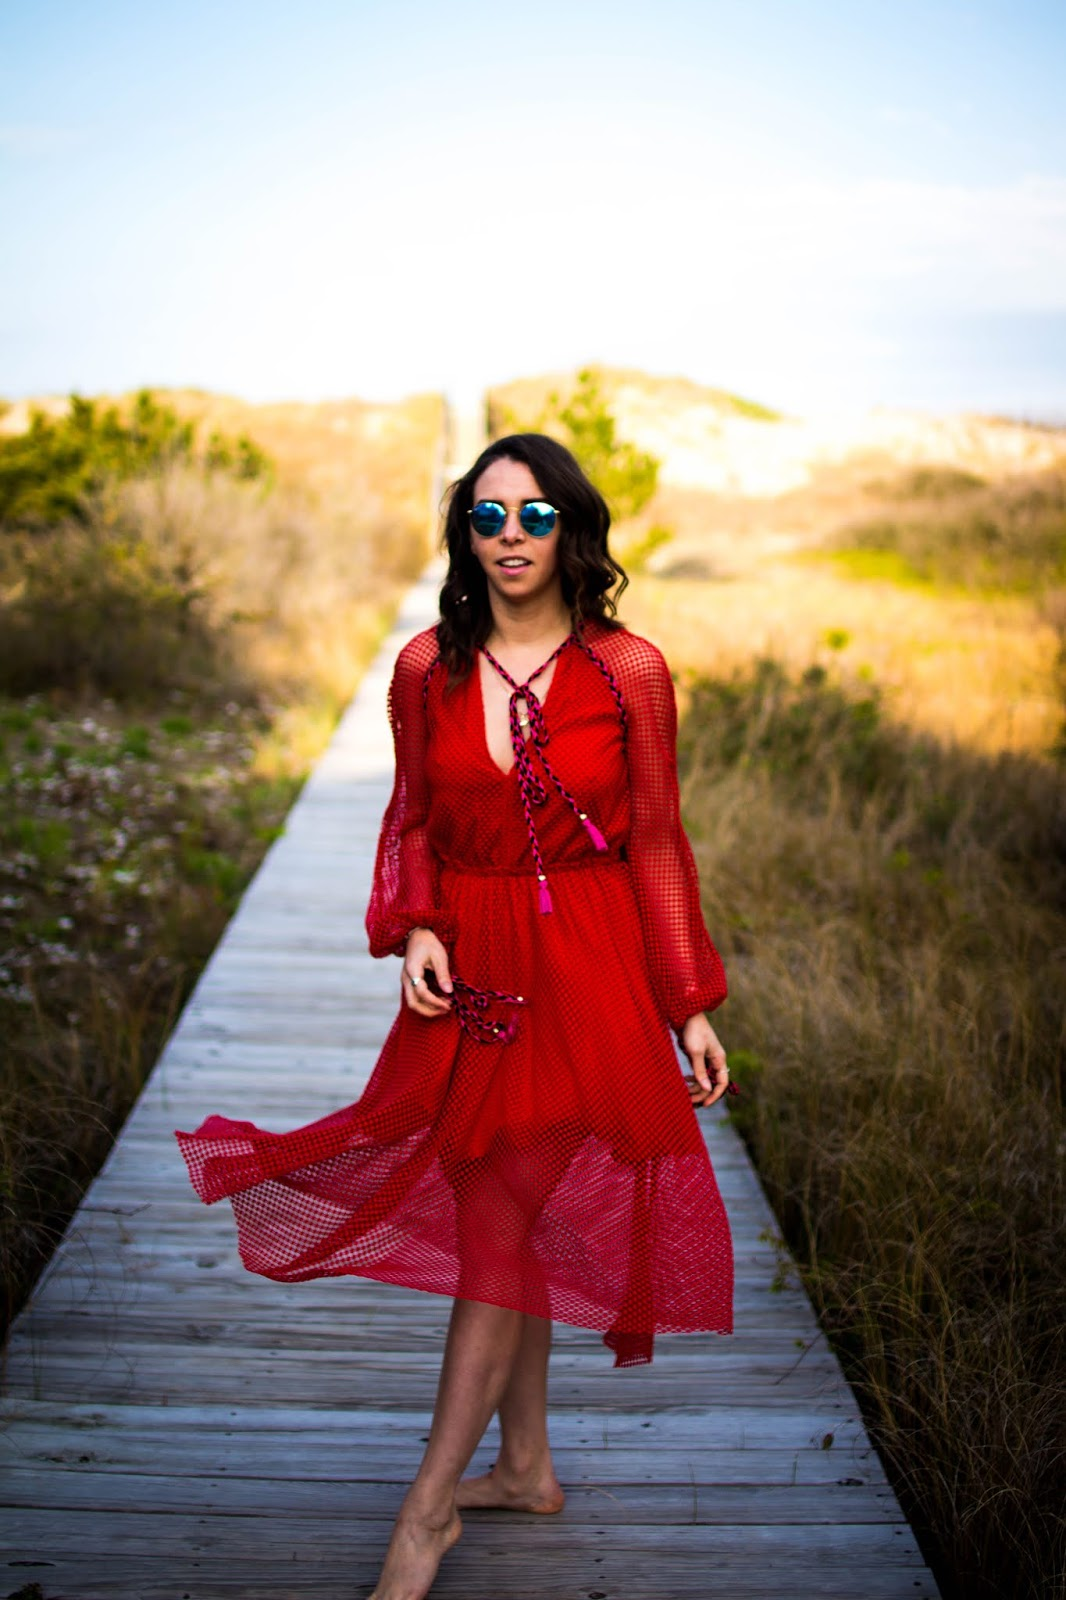 rent-the-runway-lorenzo-serafini-dress-style-dc-blogger-avizastyle-andrea-viza